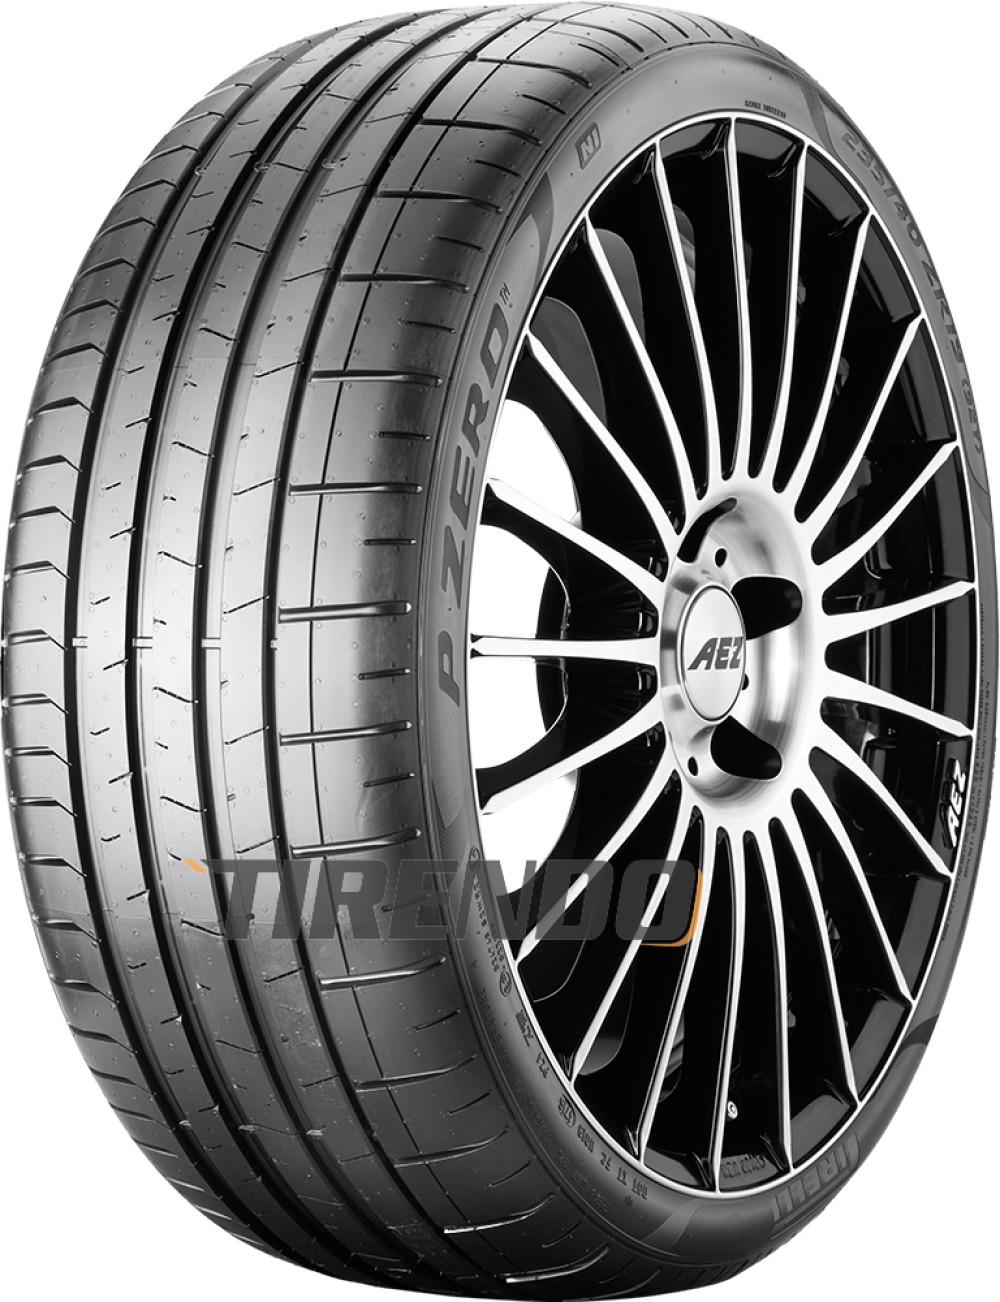 Pirelli P Zero SC  295/35R21 107Y